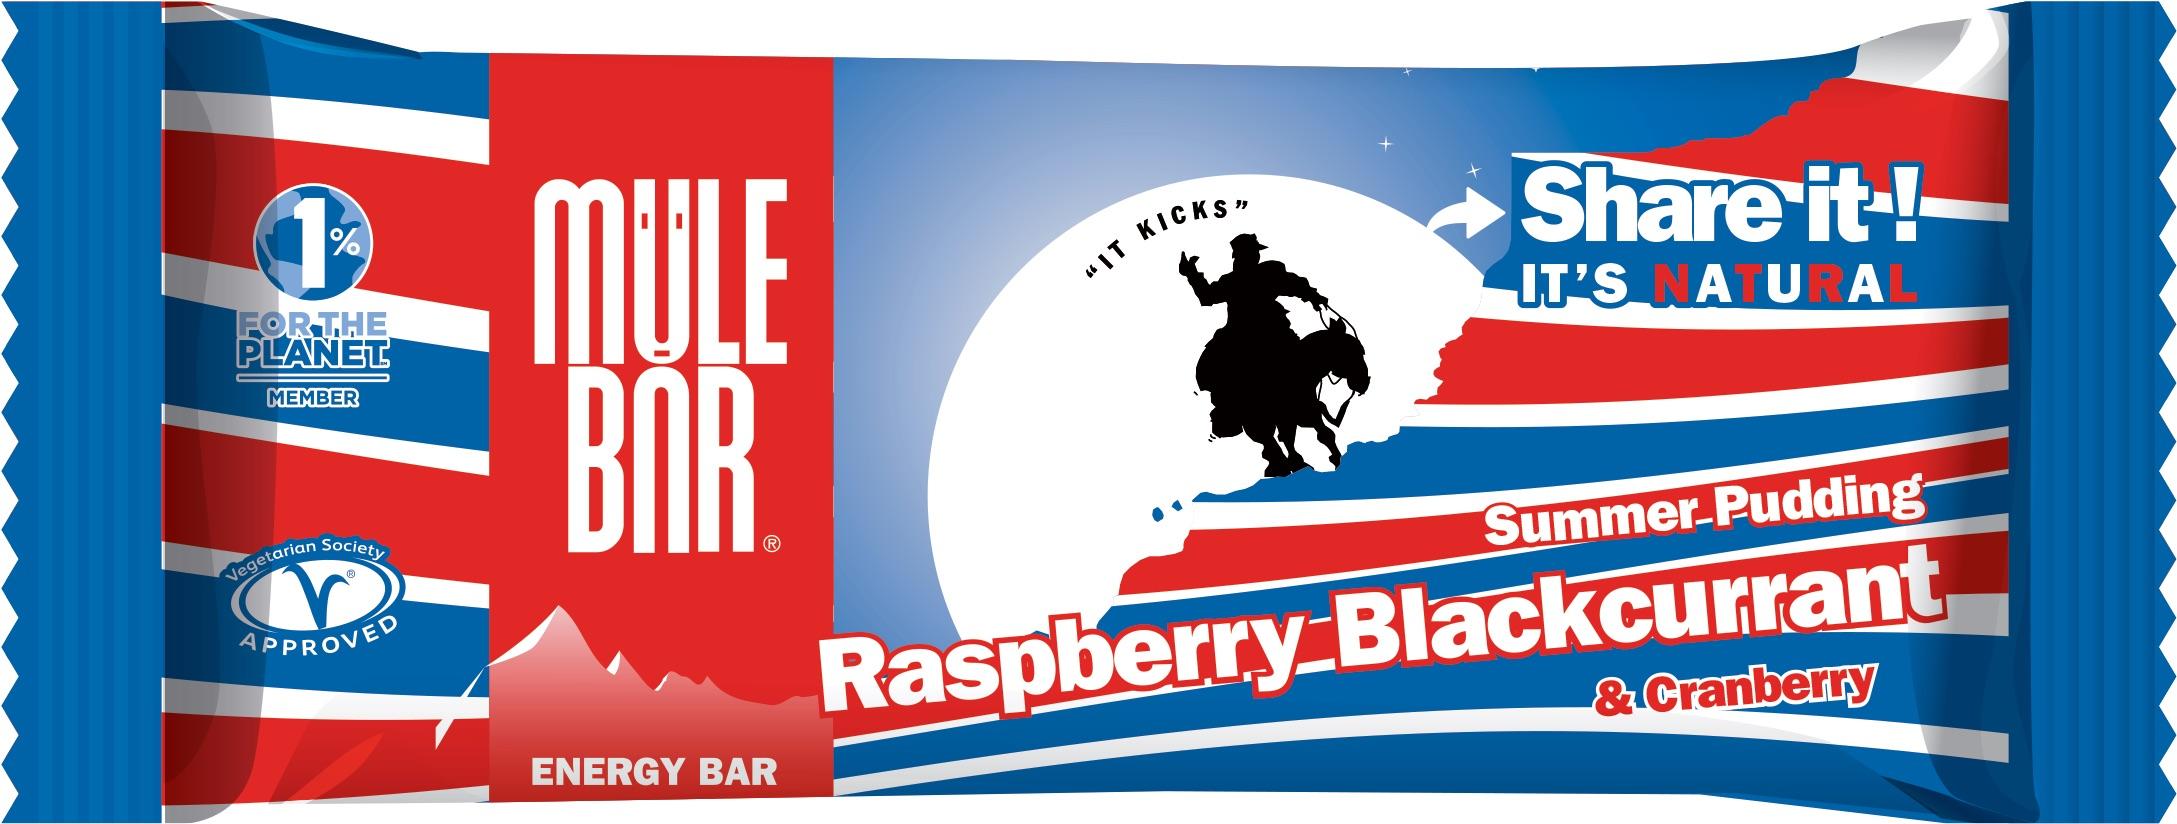 Mulebar Barre énergétique Summer Pudding - 40 g